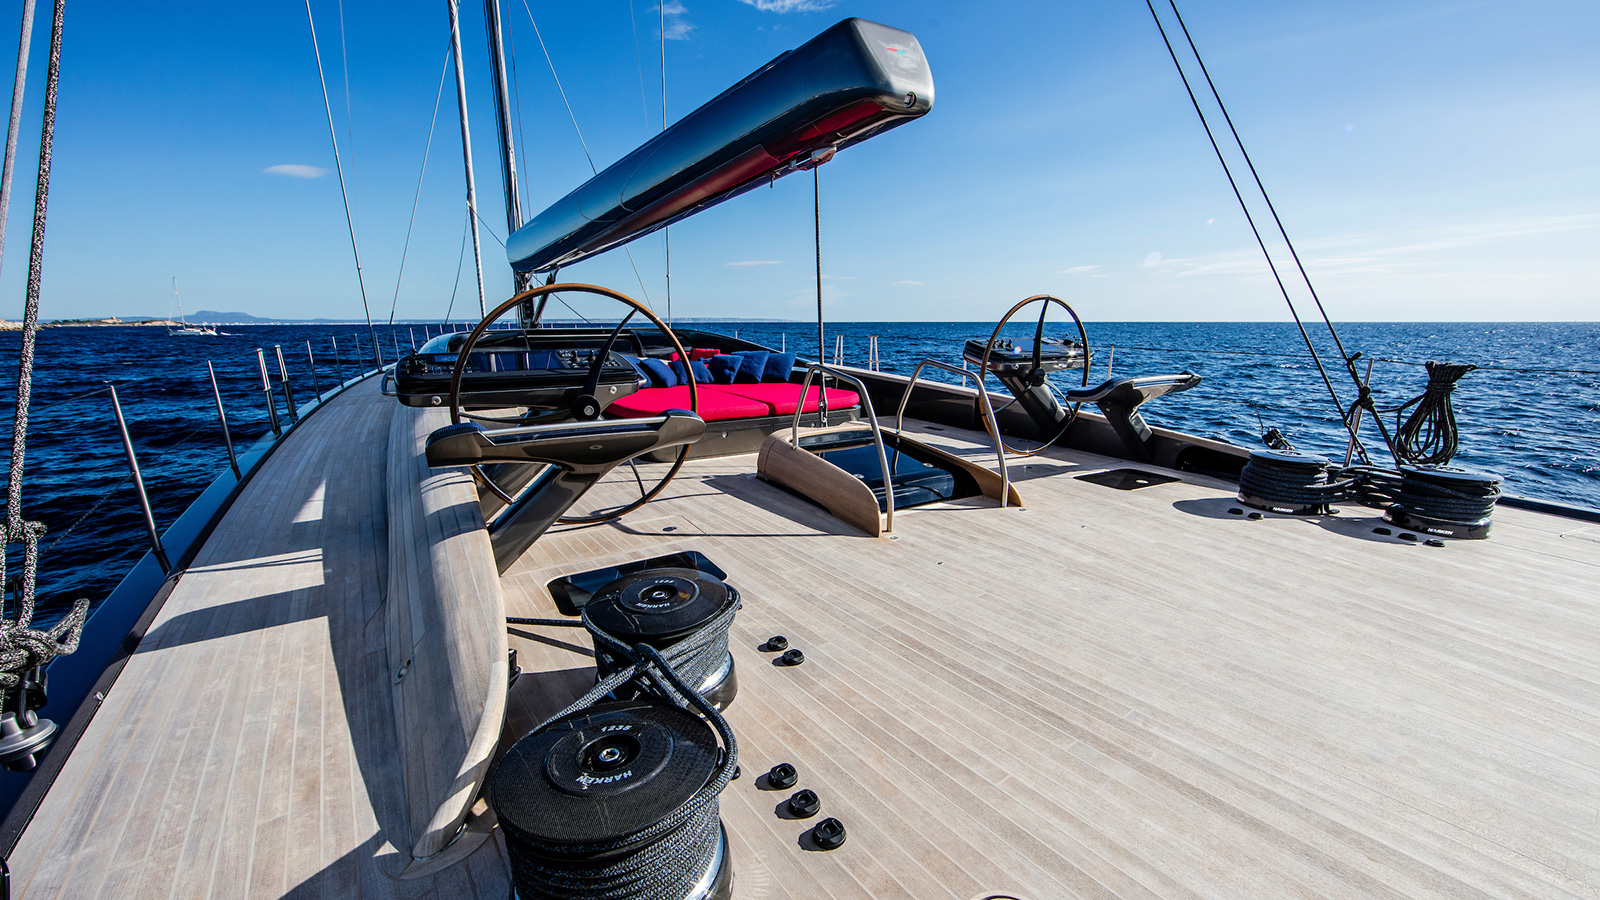 missy-sailing-super-yacht-vitters-2016-33-metre-carbon-fibre-sloop-deck